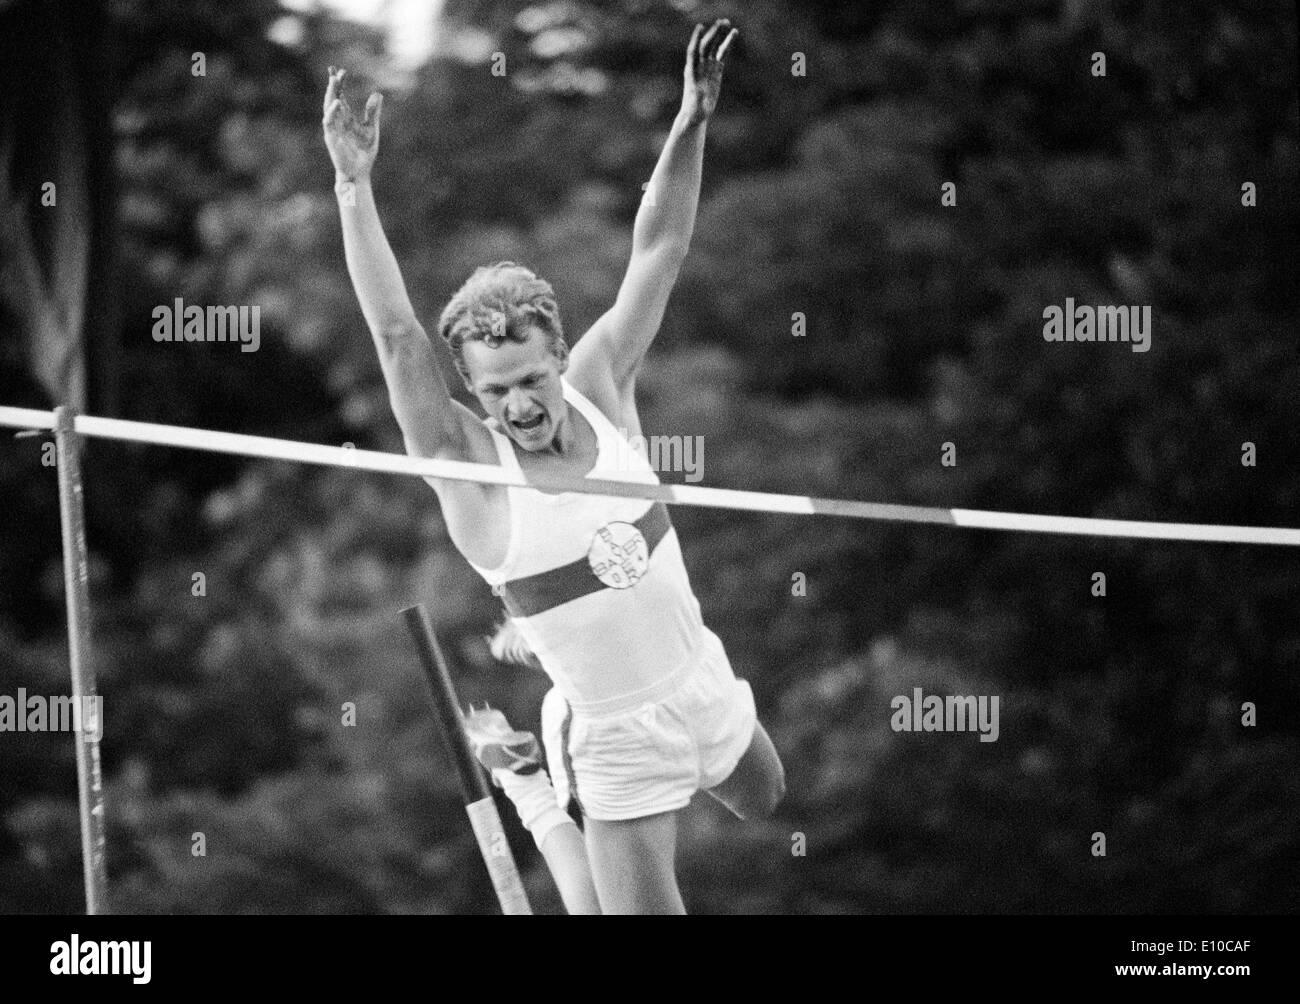 Sixties, black and white photo, sports, athletics, International Meeting in Athletics 1966 in Krefeld-Uerdingen, pole vaulting, men, pole vaulter of Bayer Leverkusen, D-Krefeld, D-Krefeld-Uerdingen, Lower Rhine, North Rhine-Westphalia - Stock Image